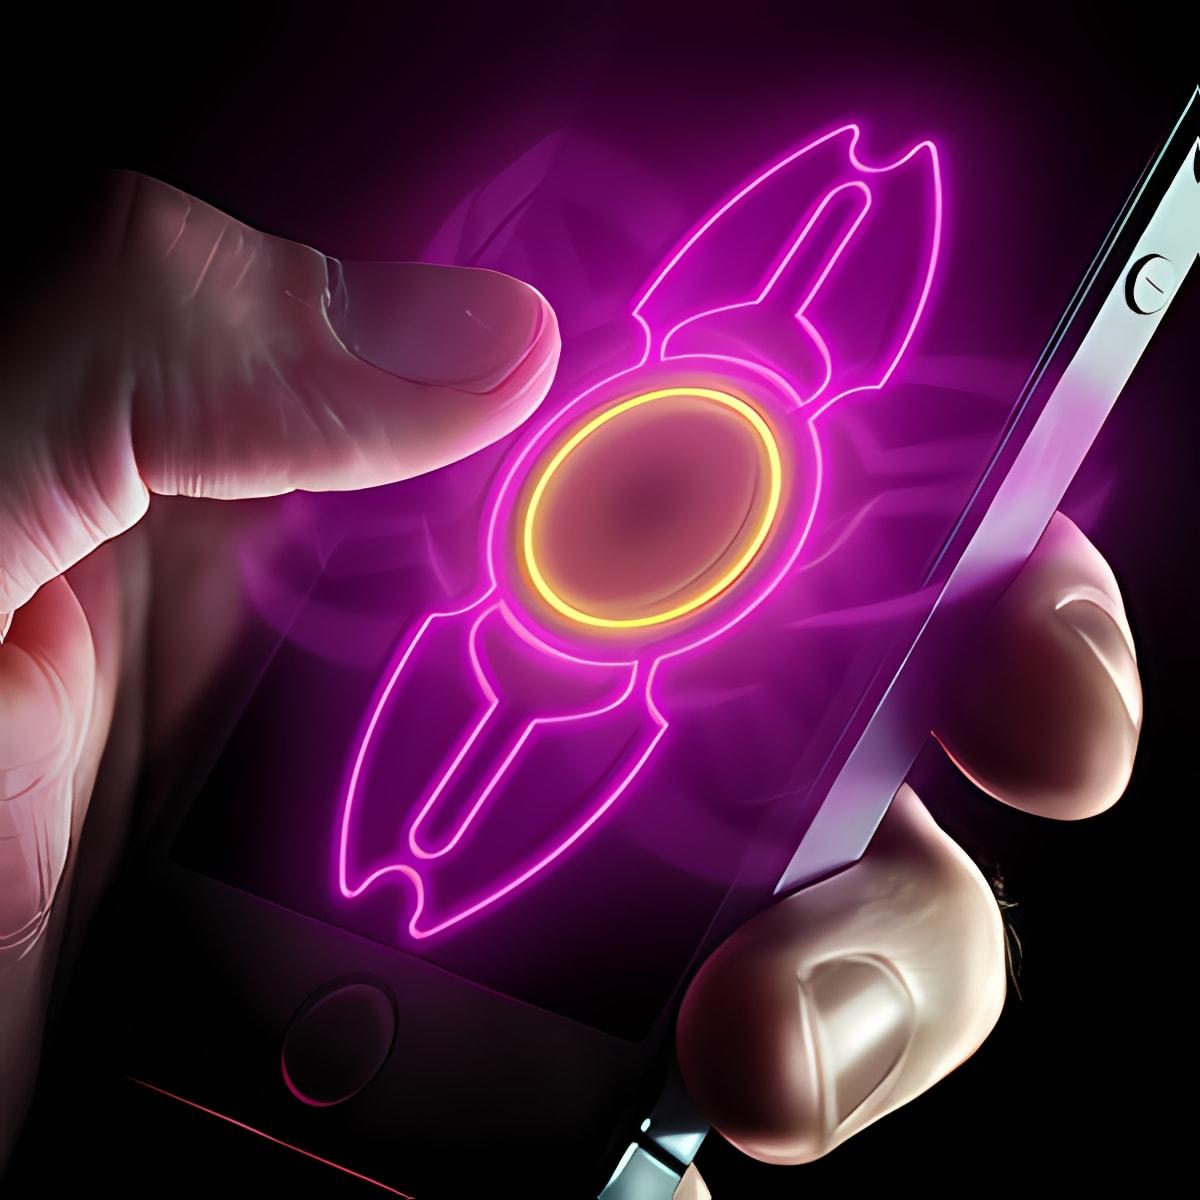 Neon hand fidget spinner 1.0